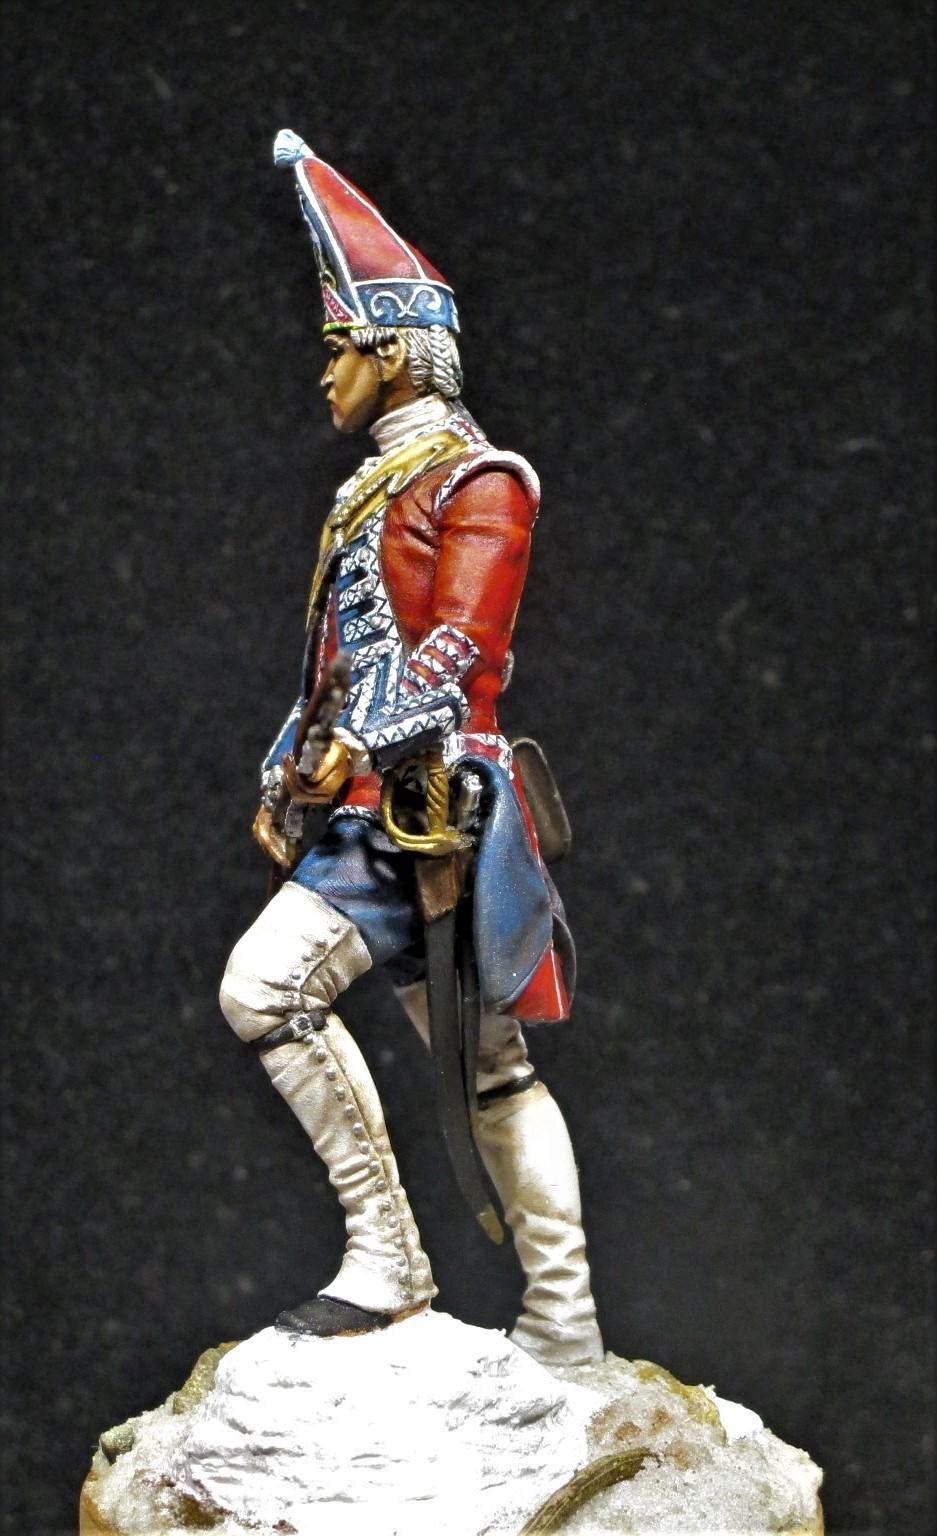 grenadier anglais du 18th Foot en 1751 Img_1210